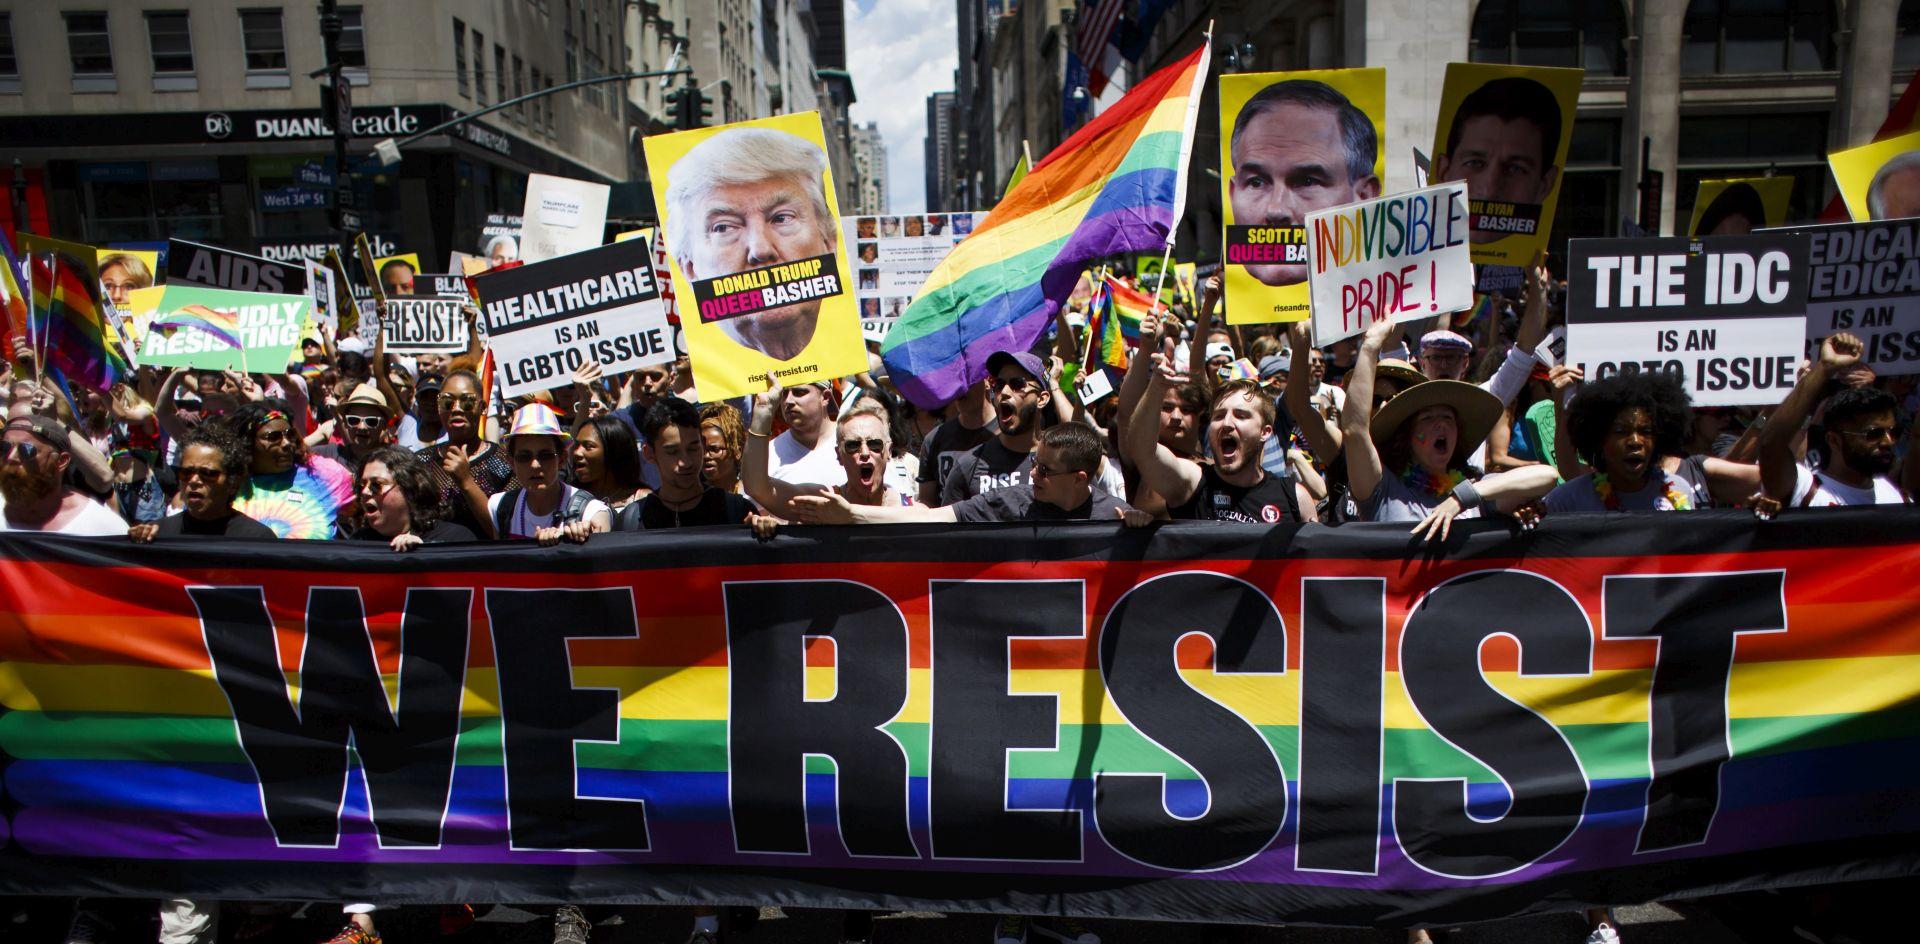 Gay Pride u New Yorku u znaku protivljenja Trumpu